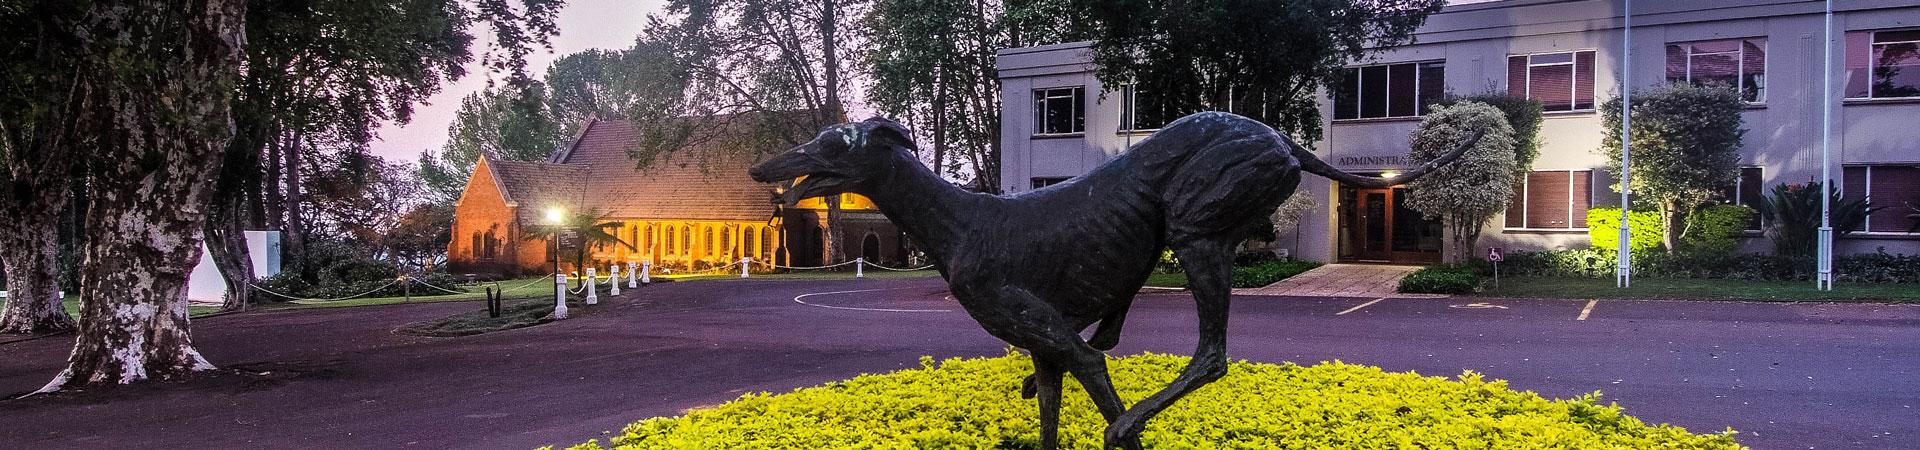 kearsney-college-old-boys-banner-greyhound-statue